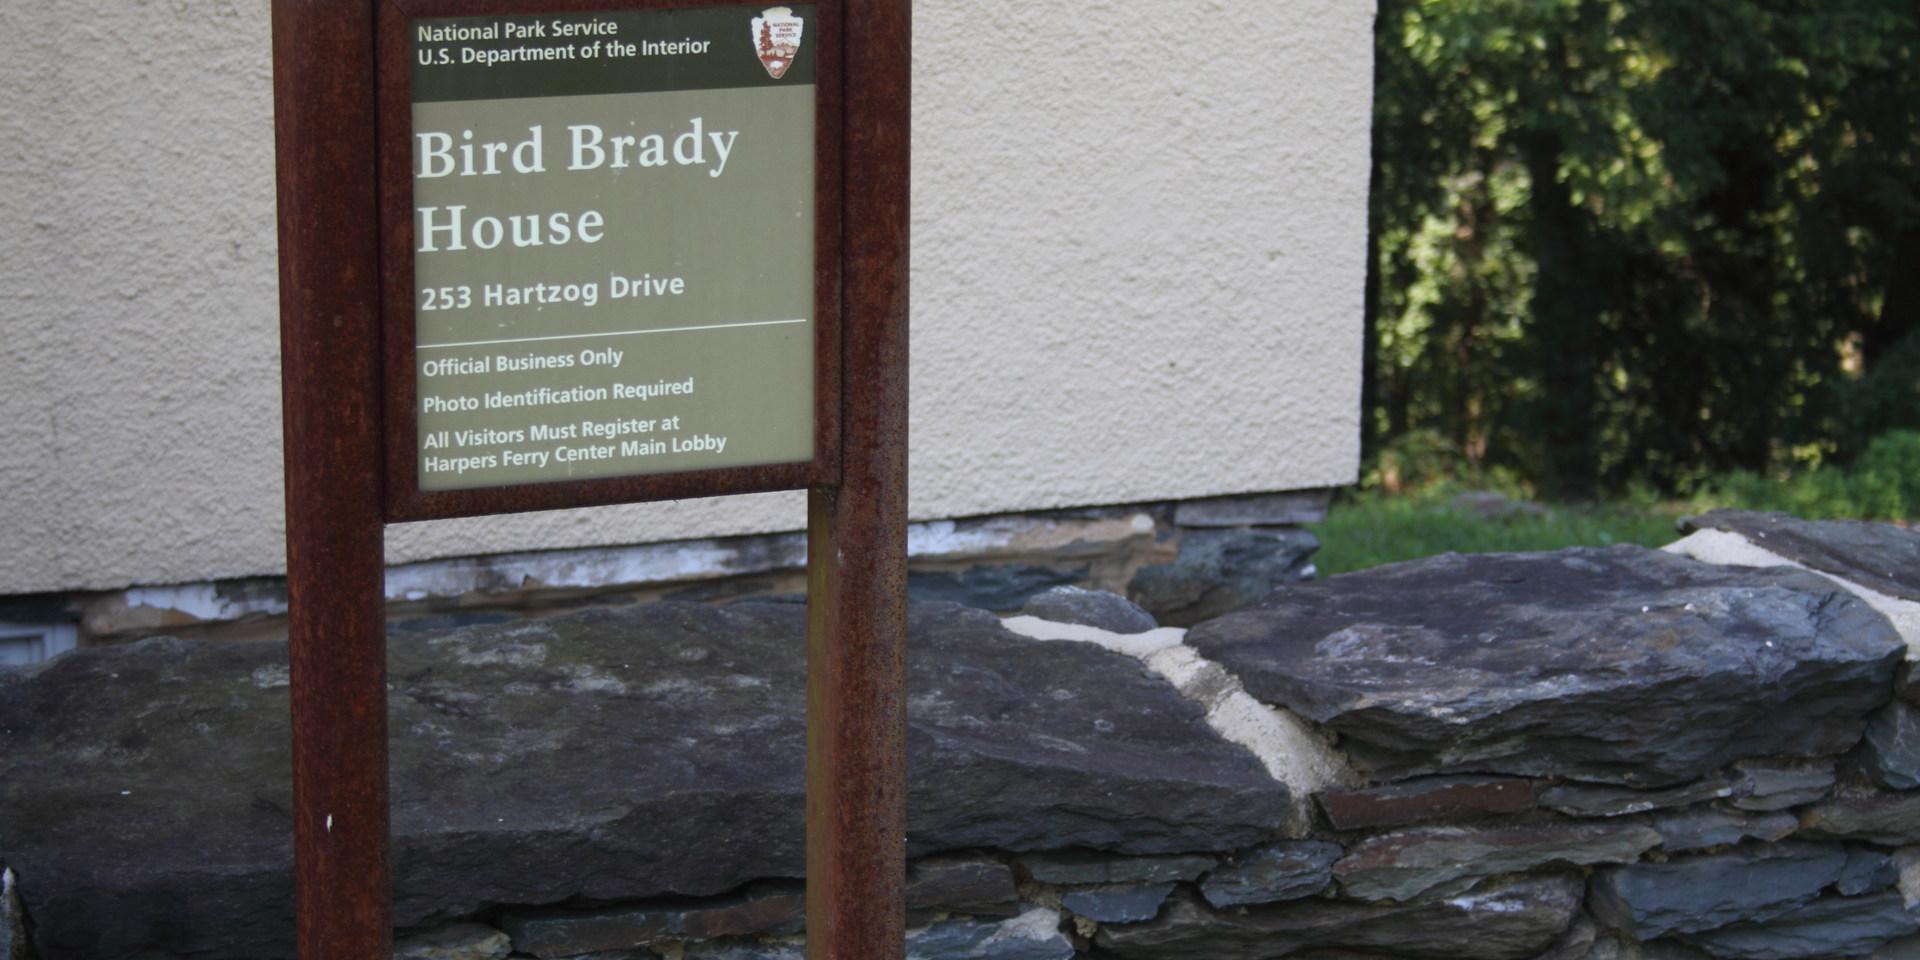 37. Bird Brady House sign   (Photo by G. Maurice Ballard)